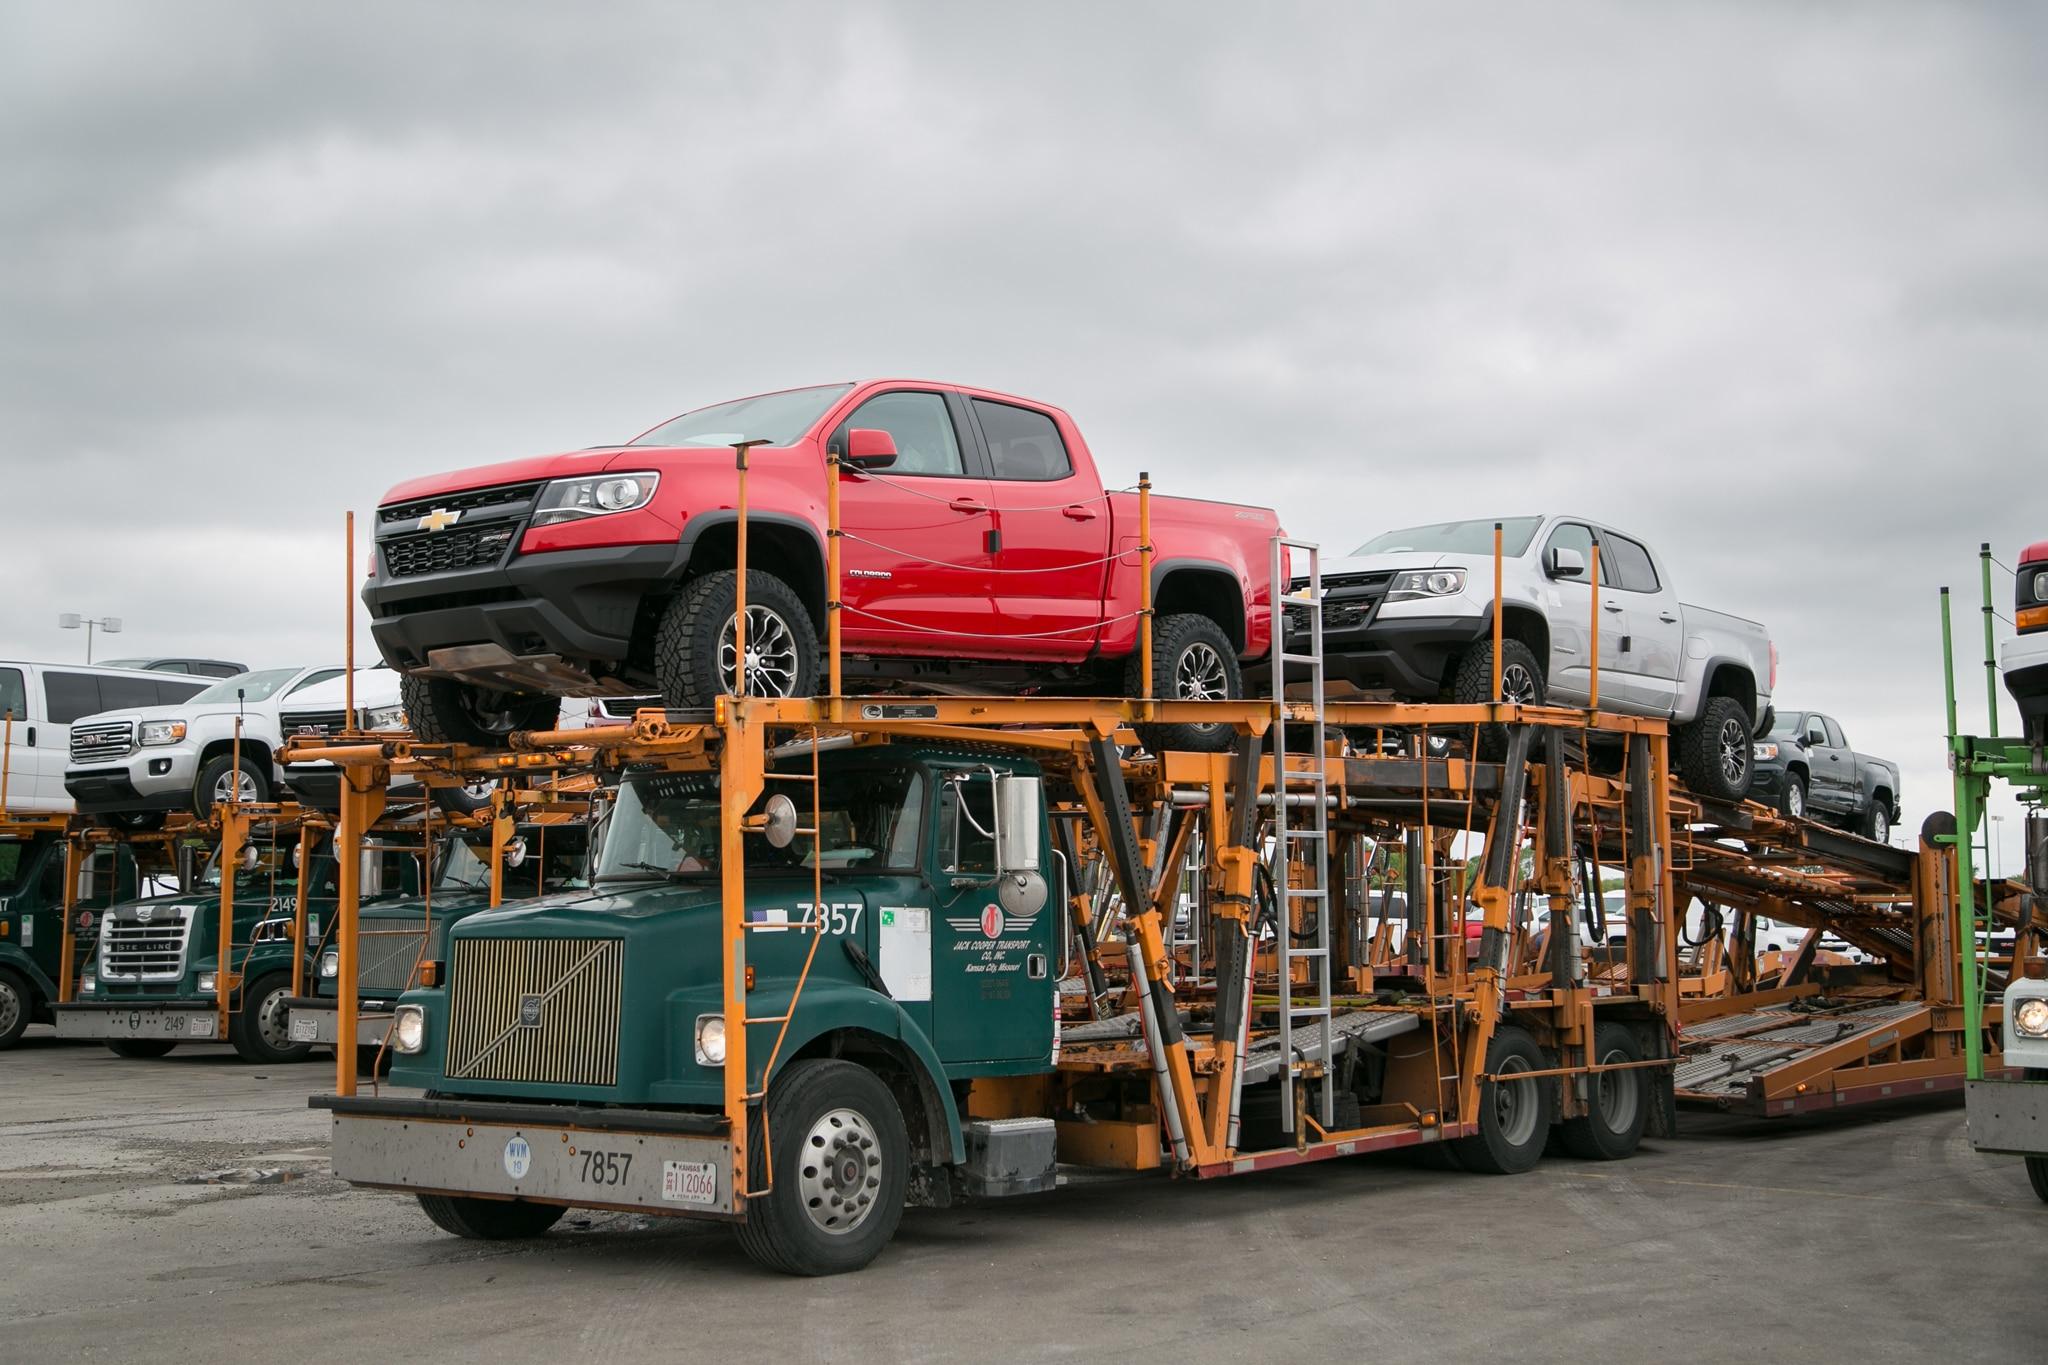 2017 chevrolet colorado zr2 truck transporter